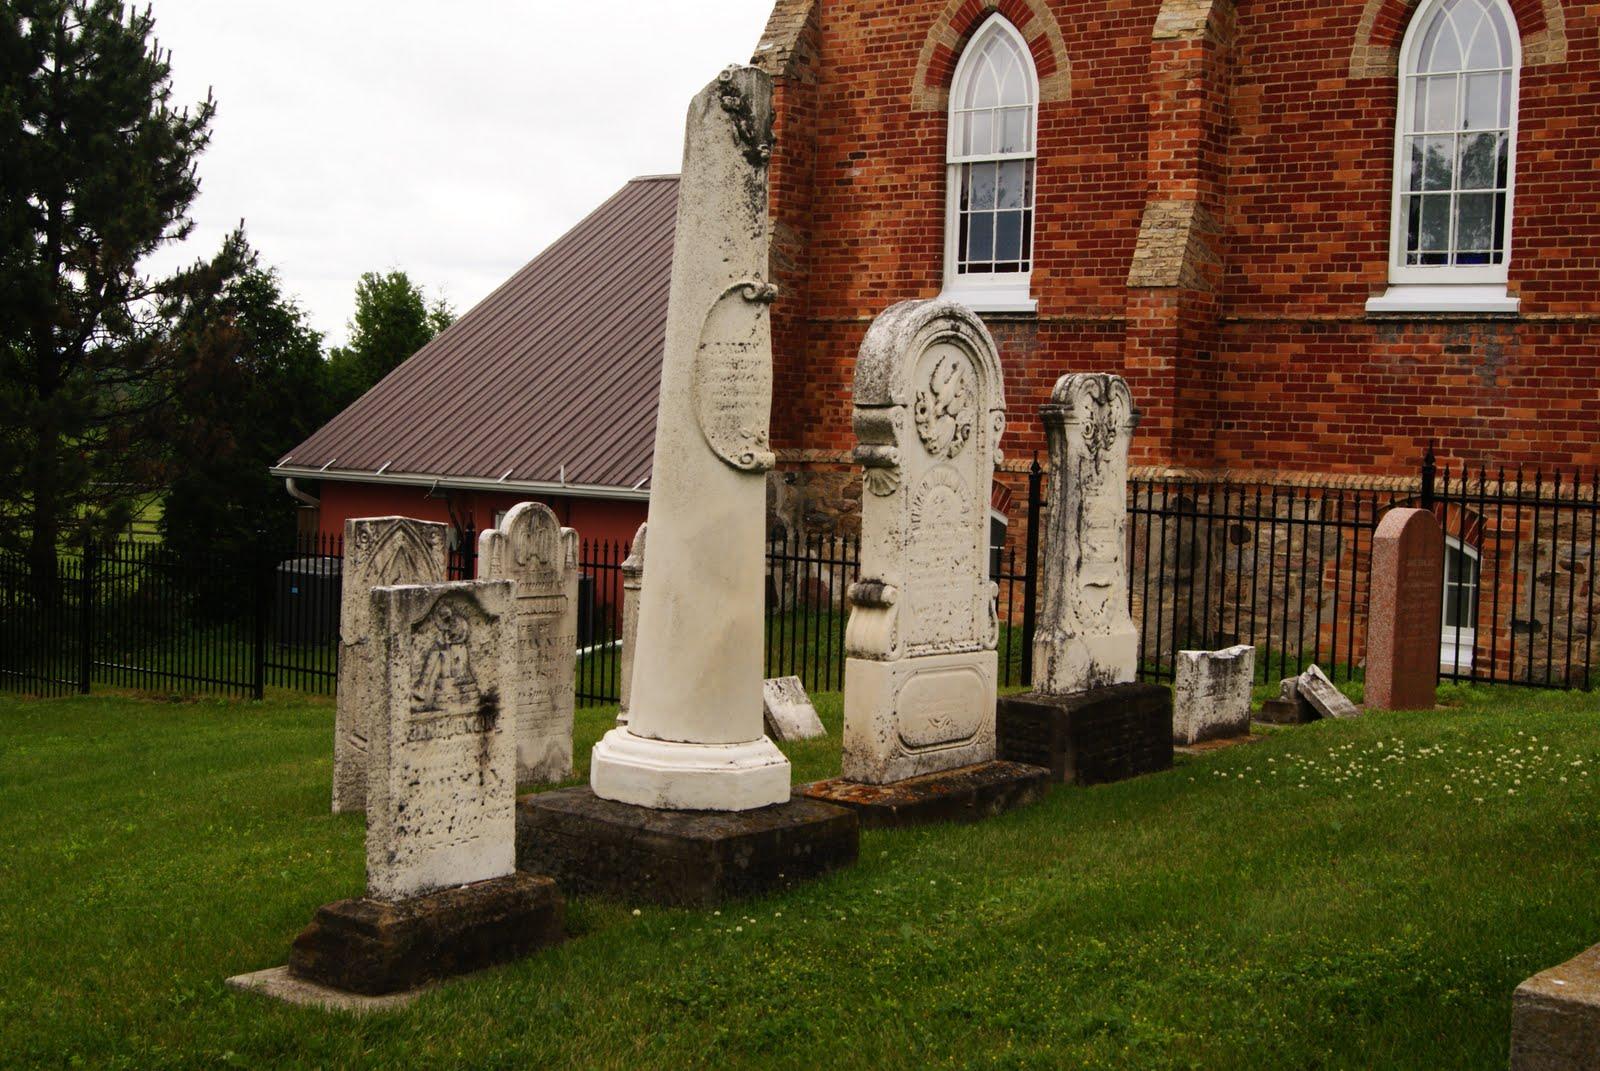 Melville Church Cemetery, Markham